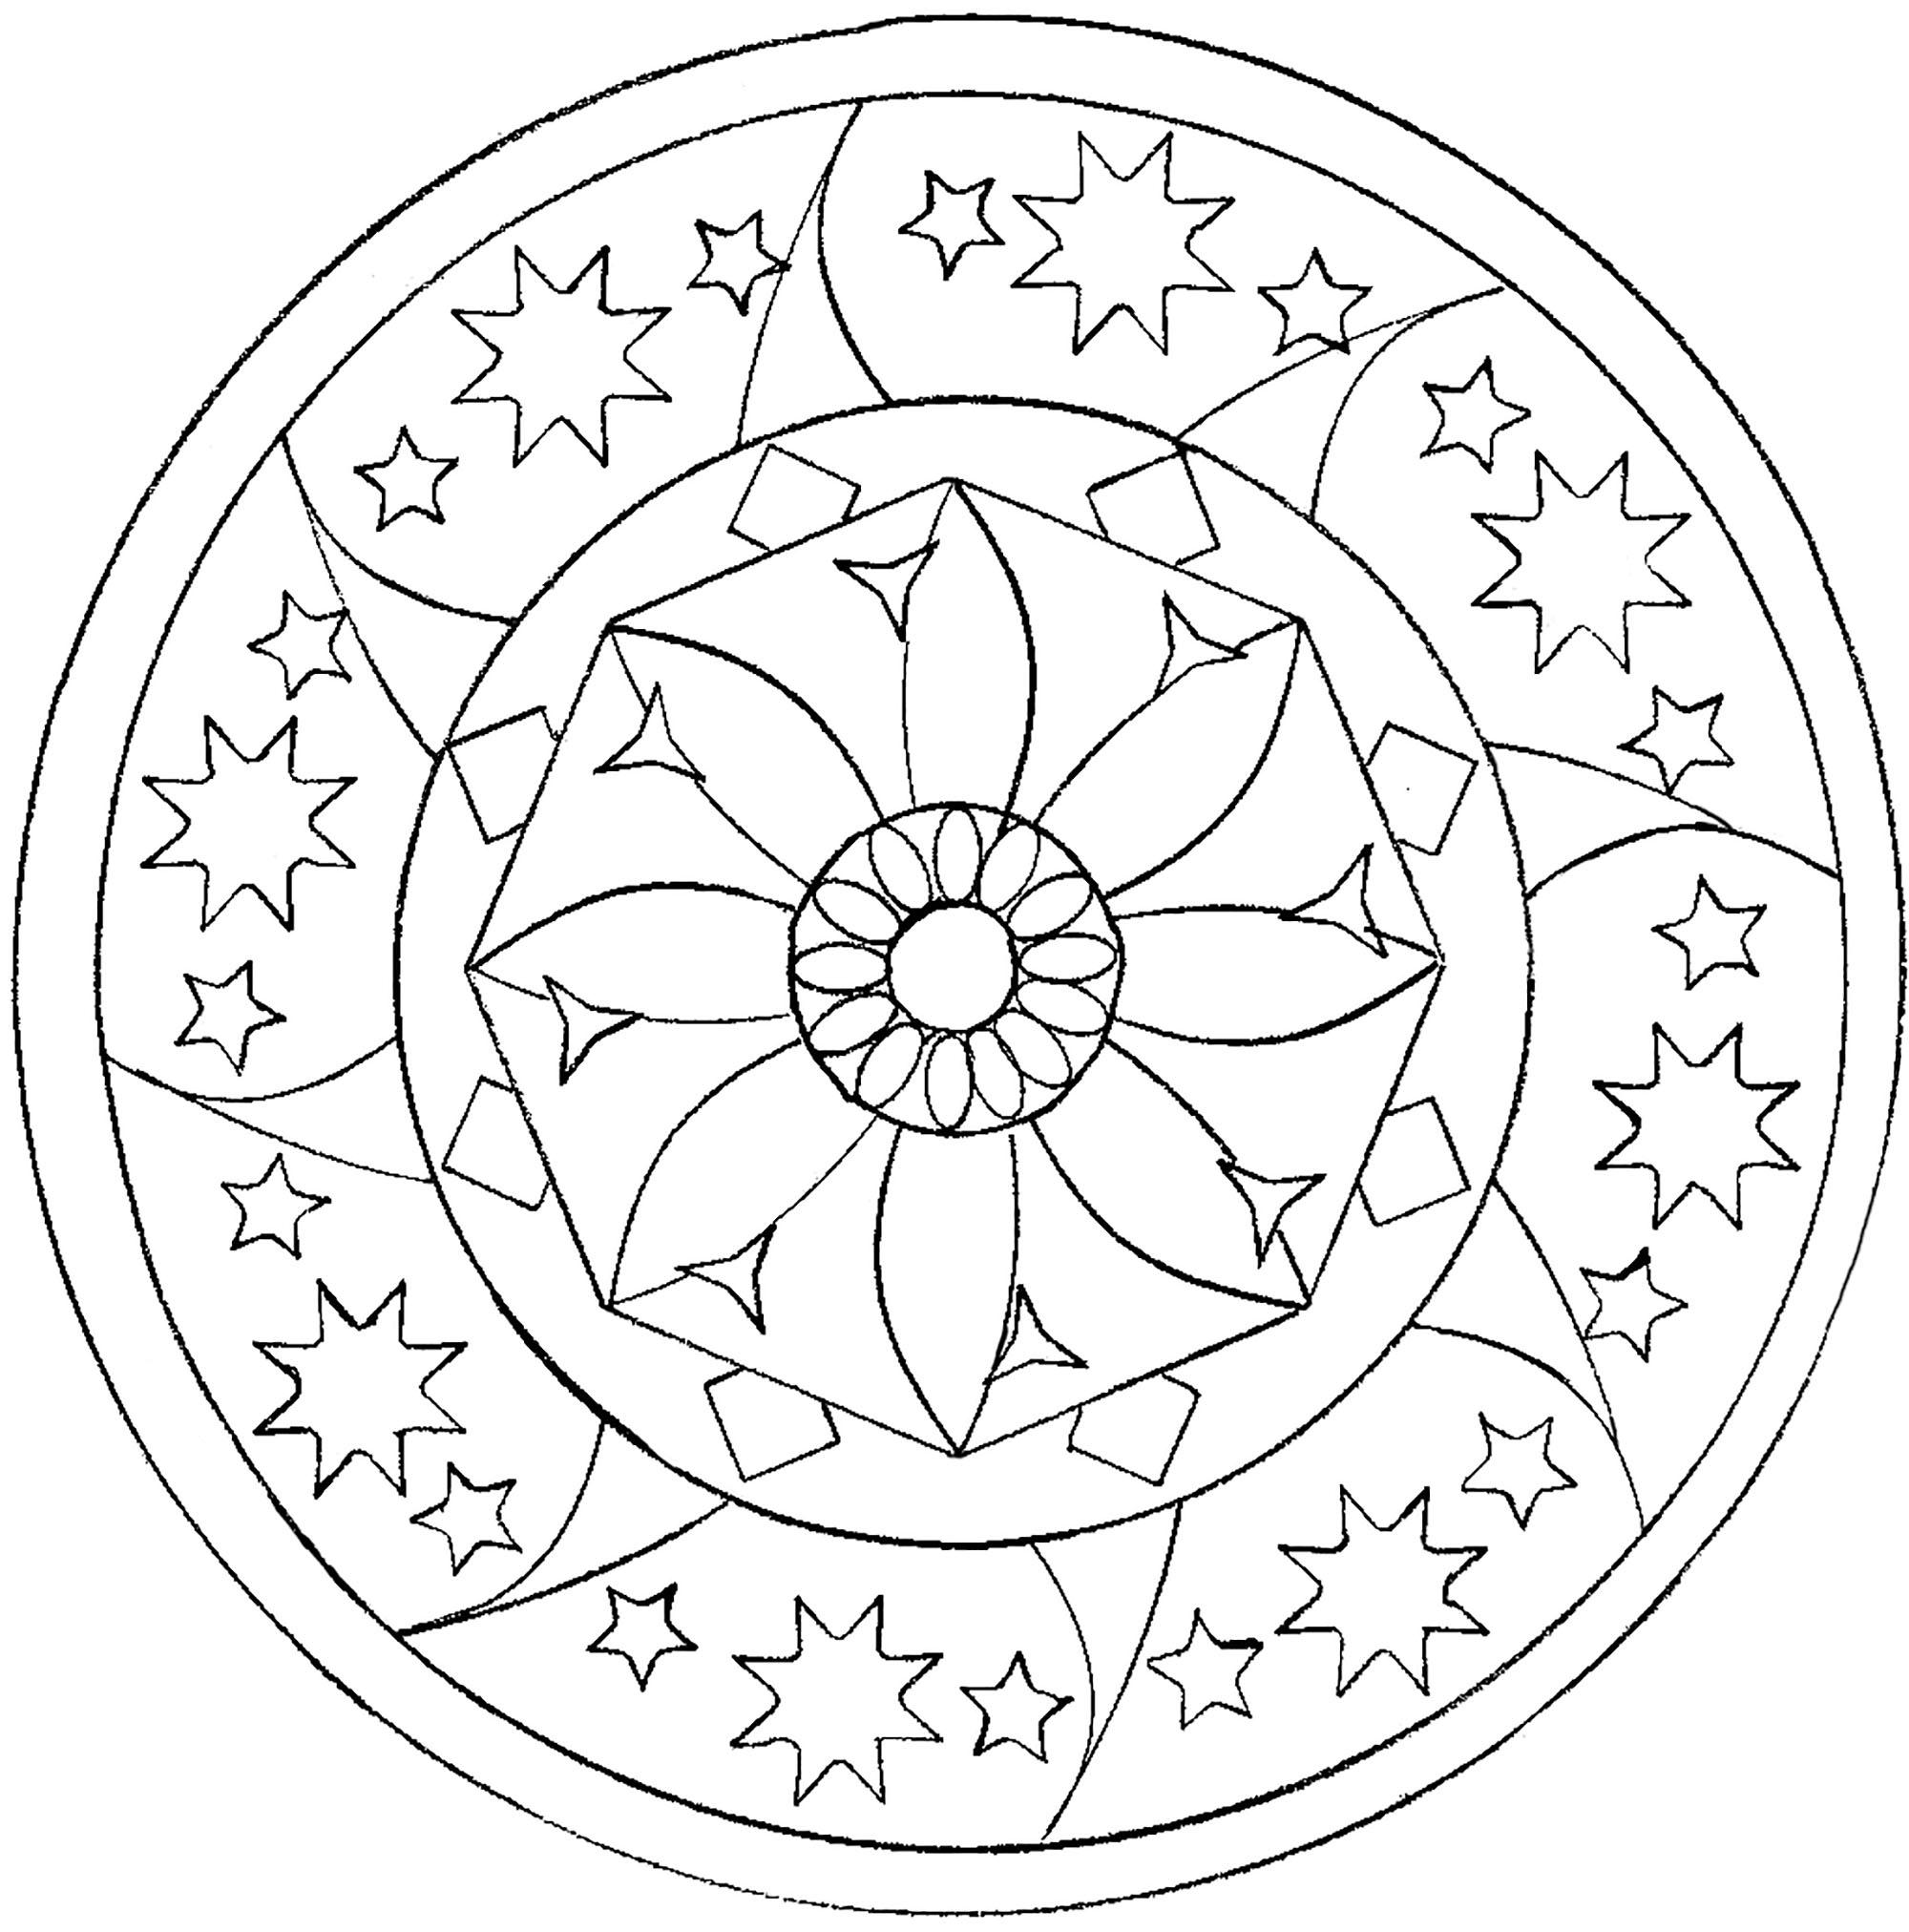 Mandala étoilé Mandalas Faciles Pour Enfants 100 Mandalas Zen